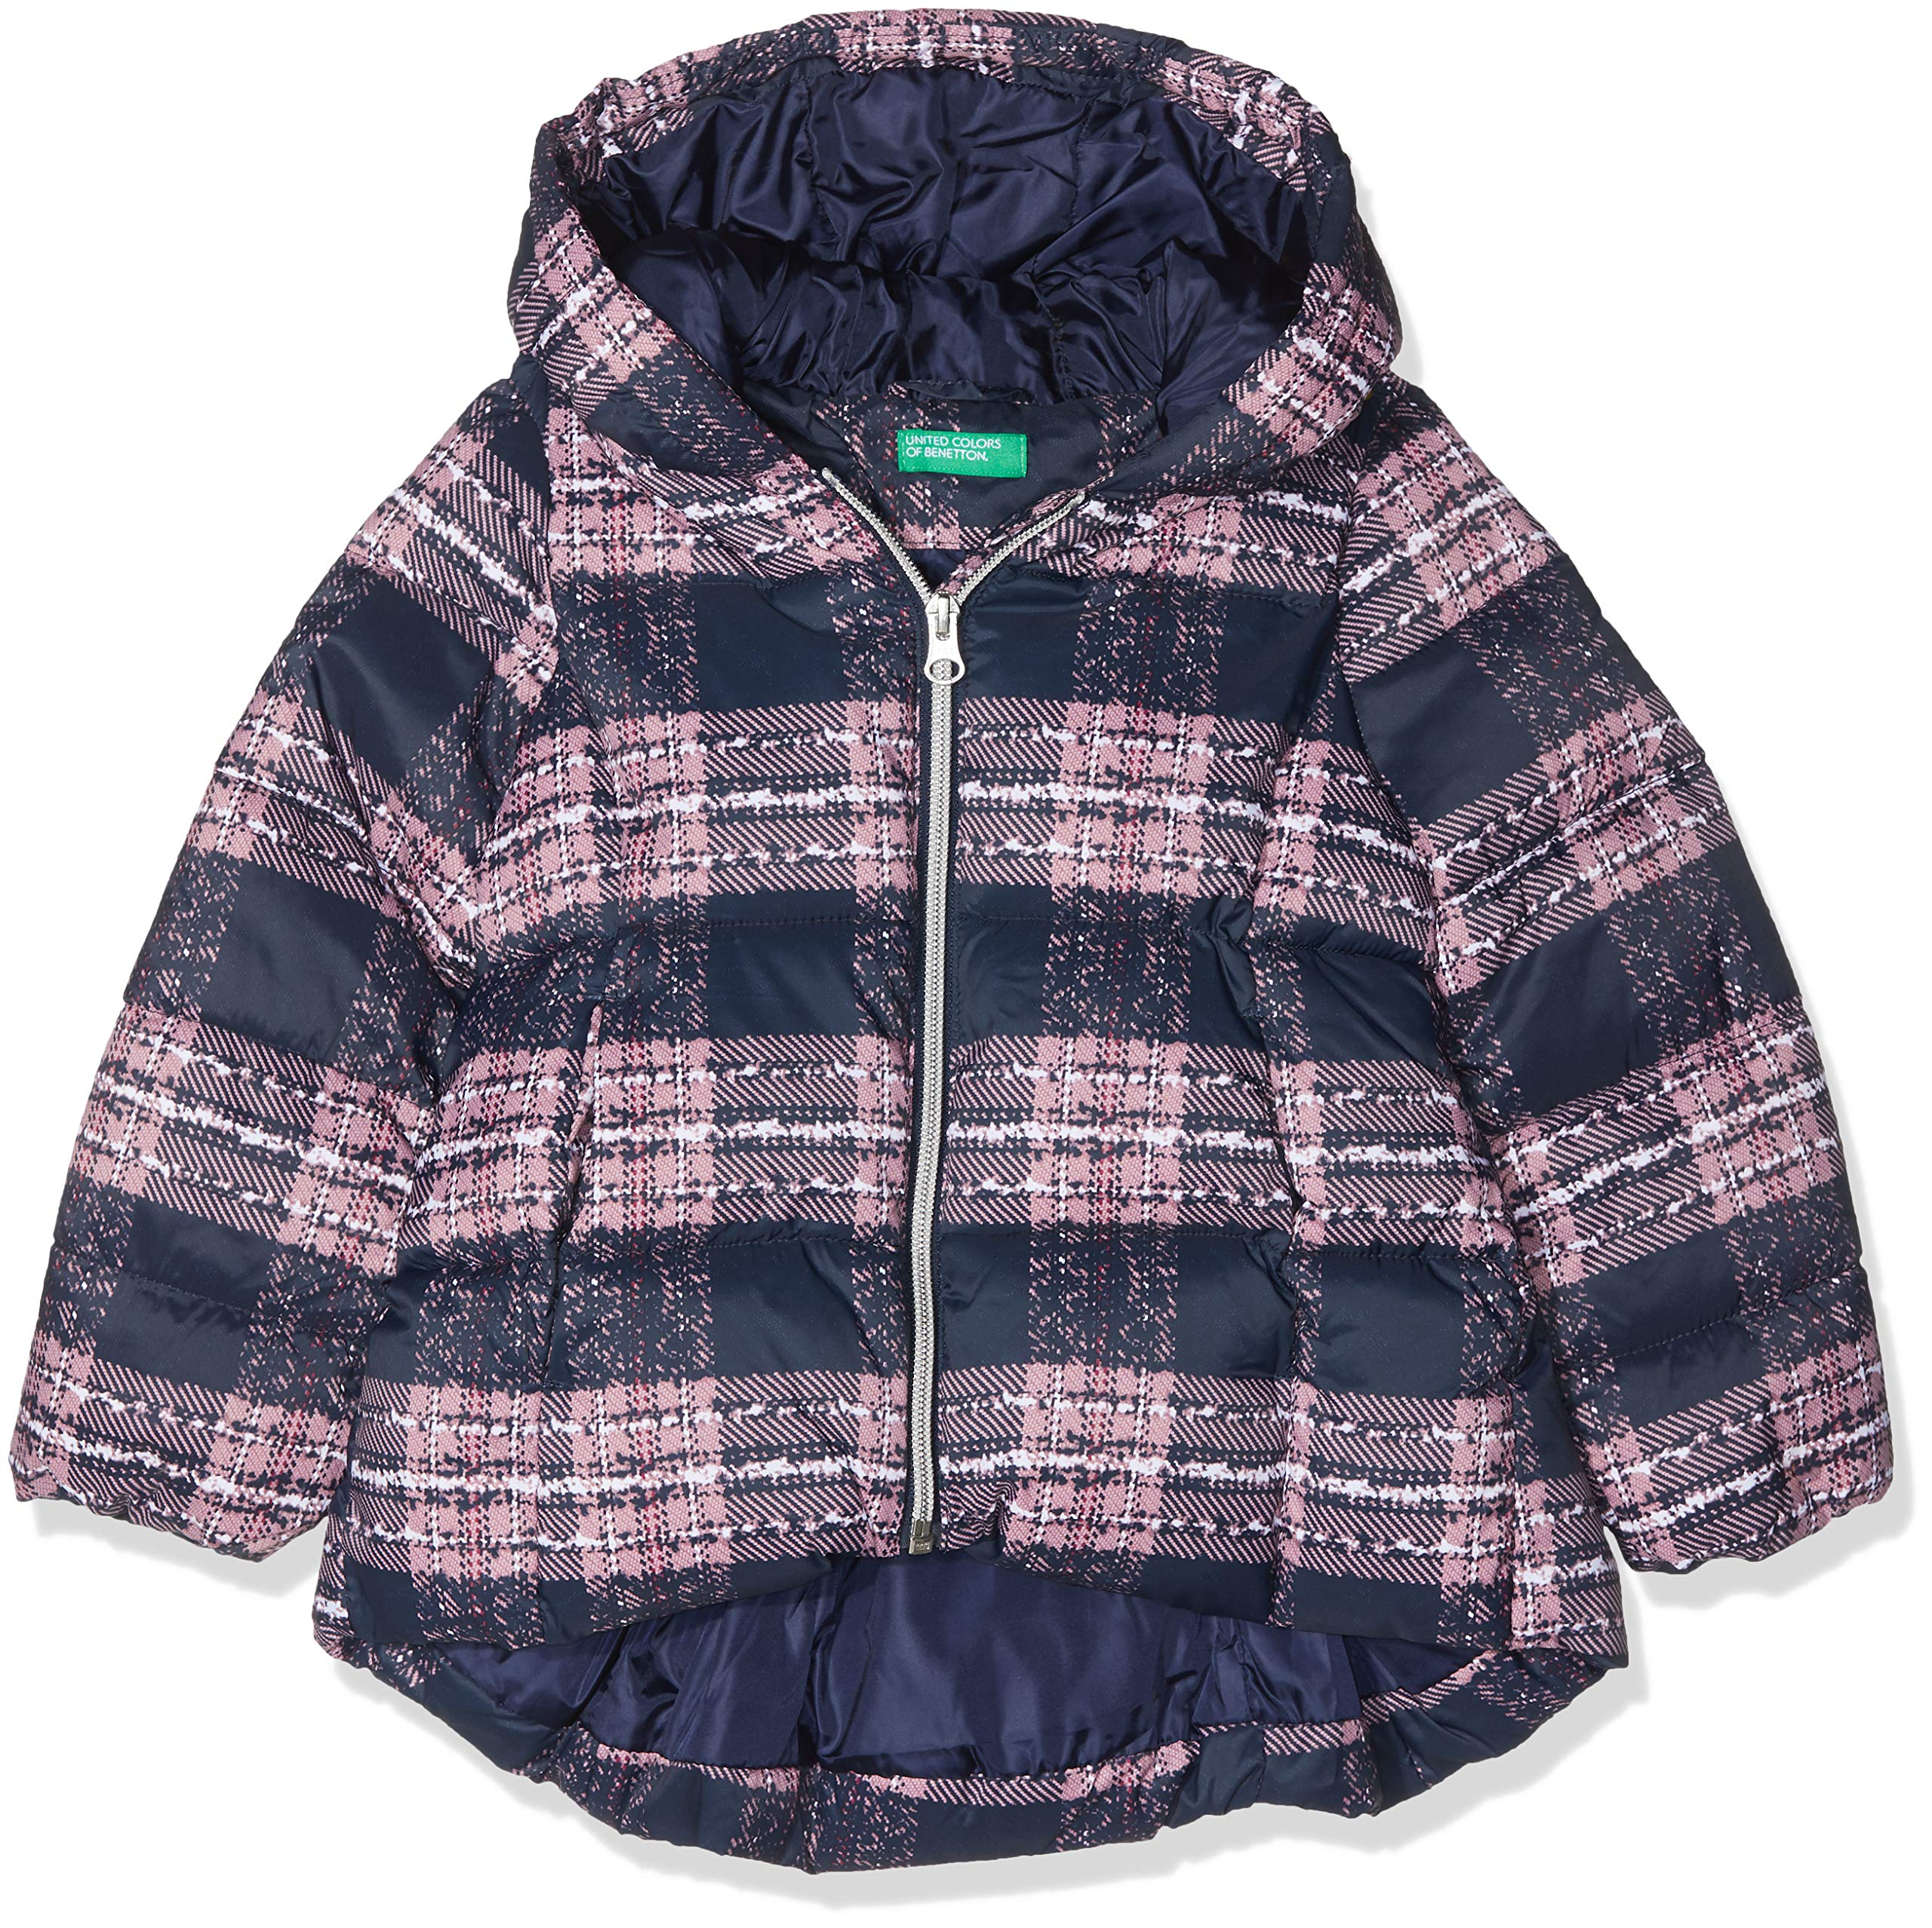 United Colors of Benetton Jacket, Chaqueta para Niñas product image